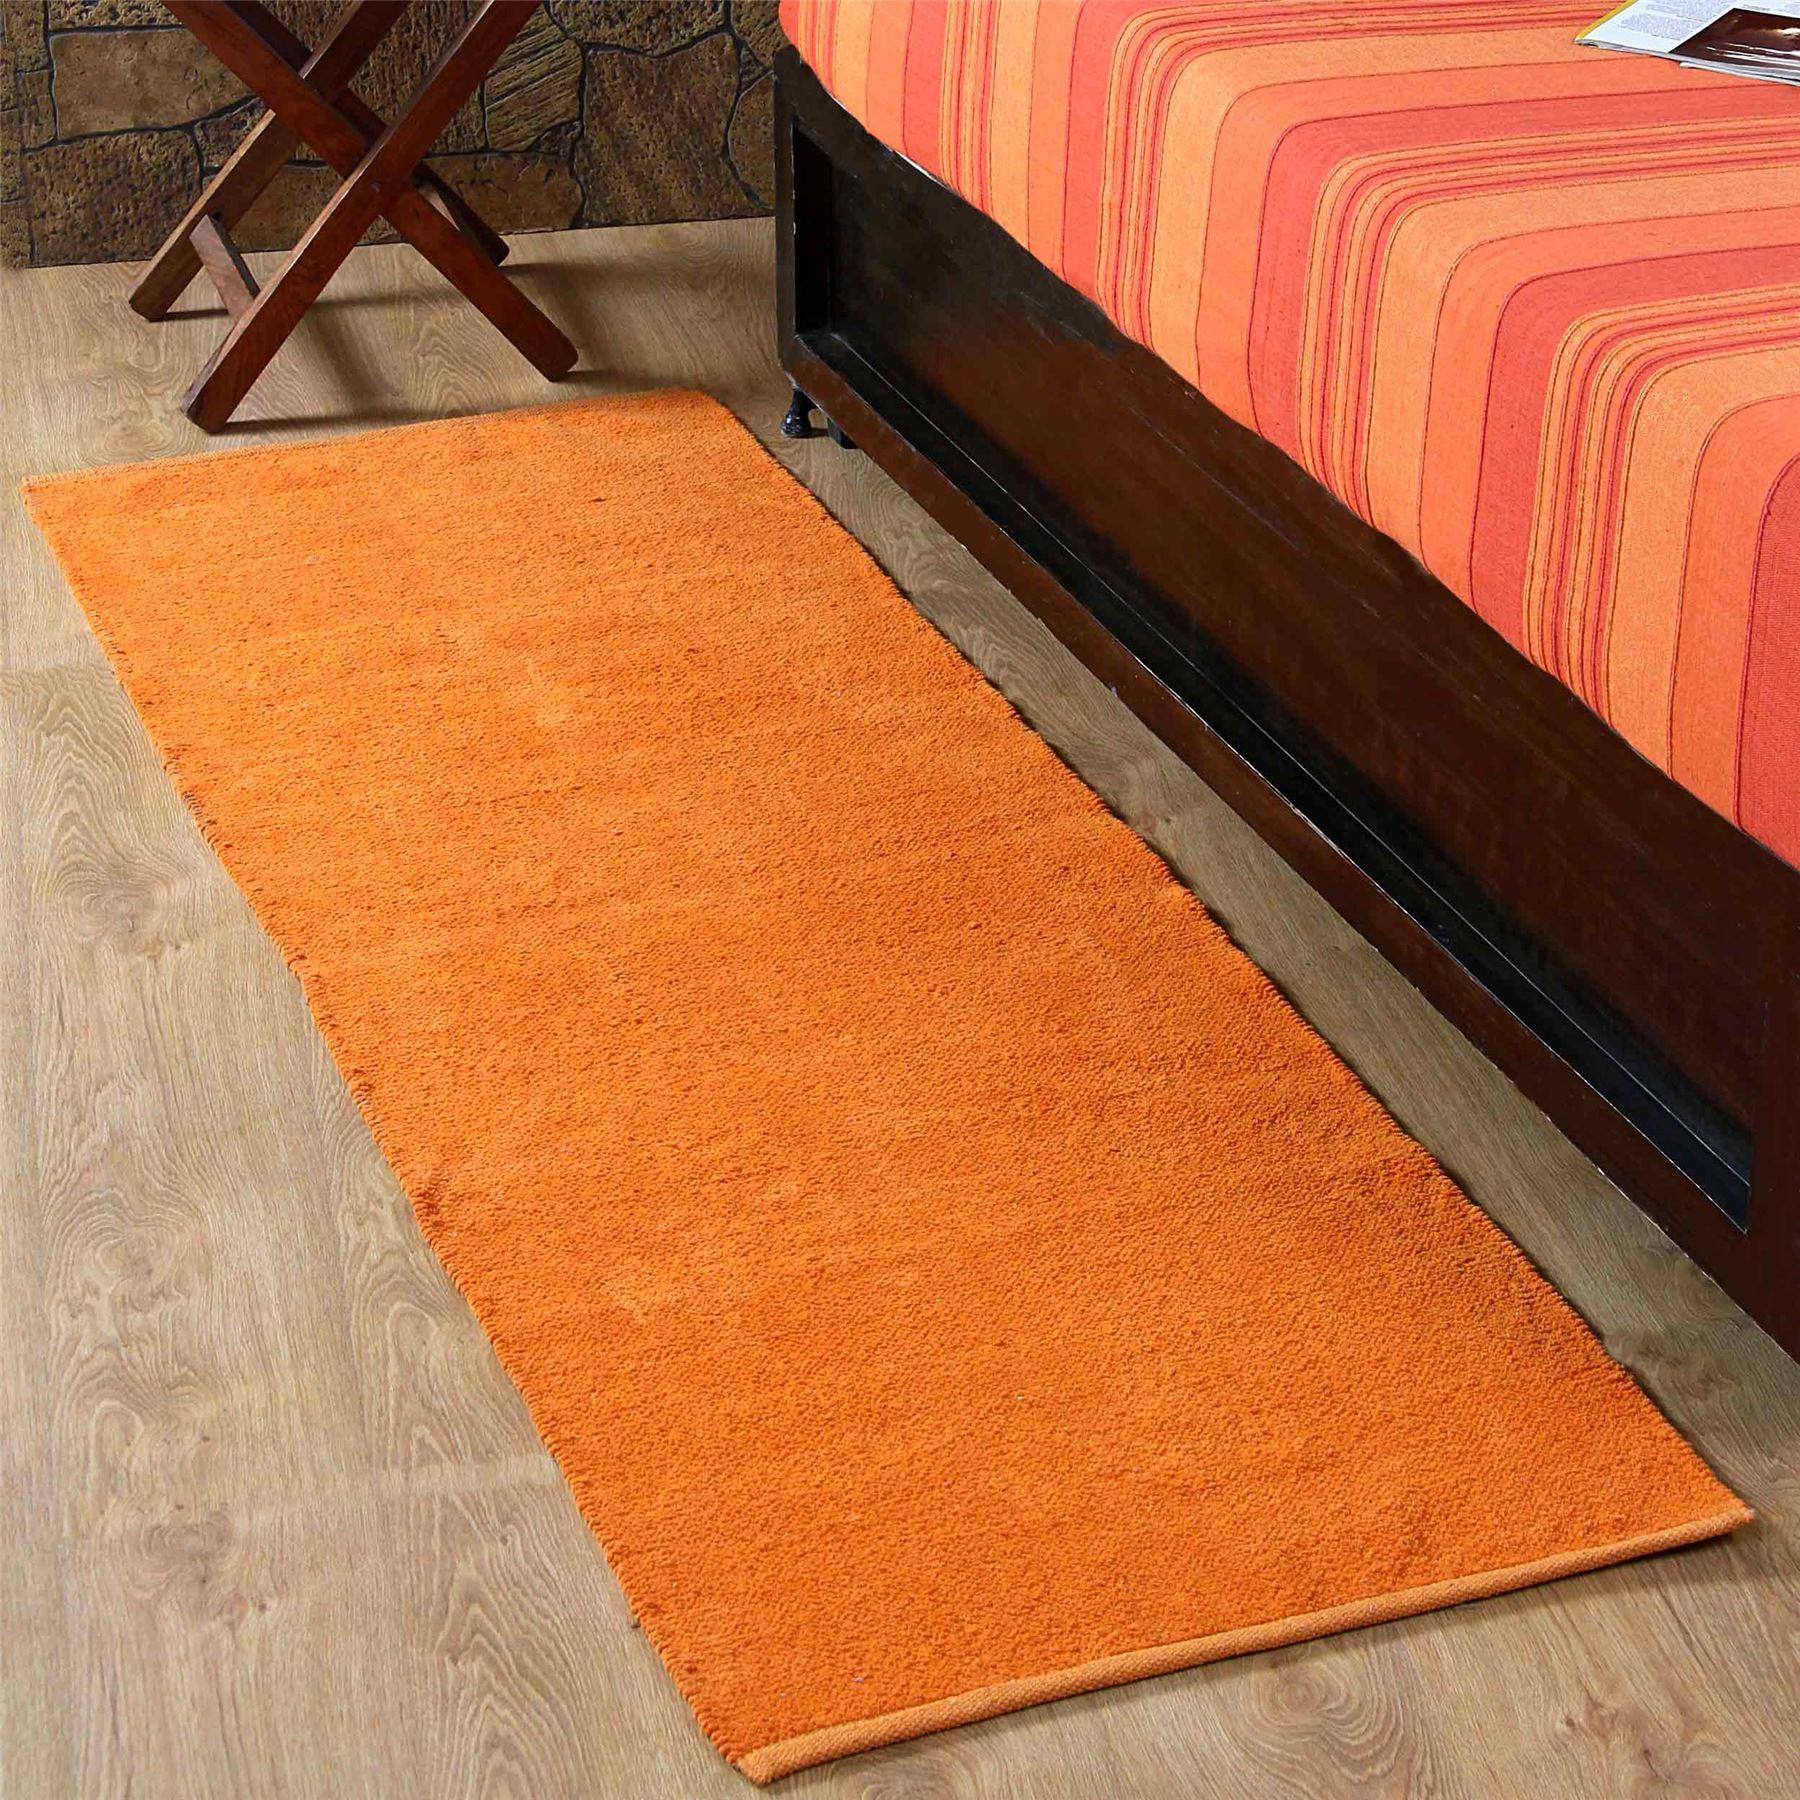 shower floor stone products home cotton classic parachute mats tub mat